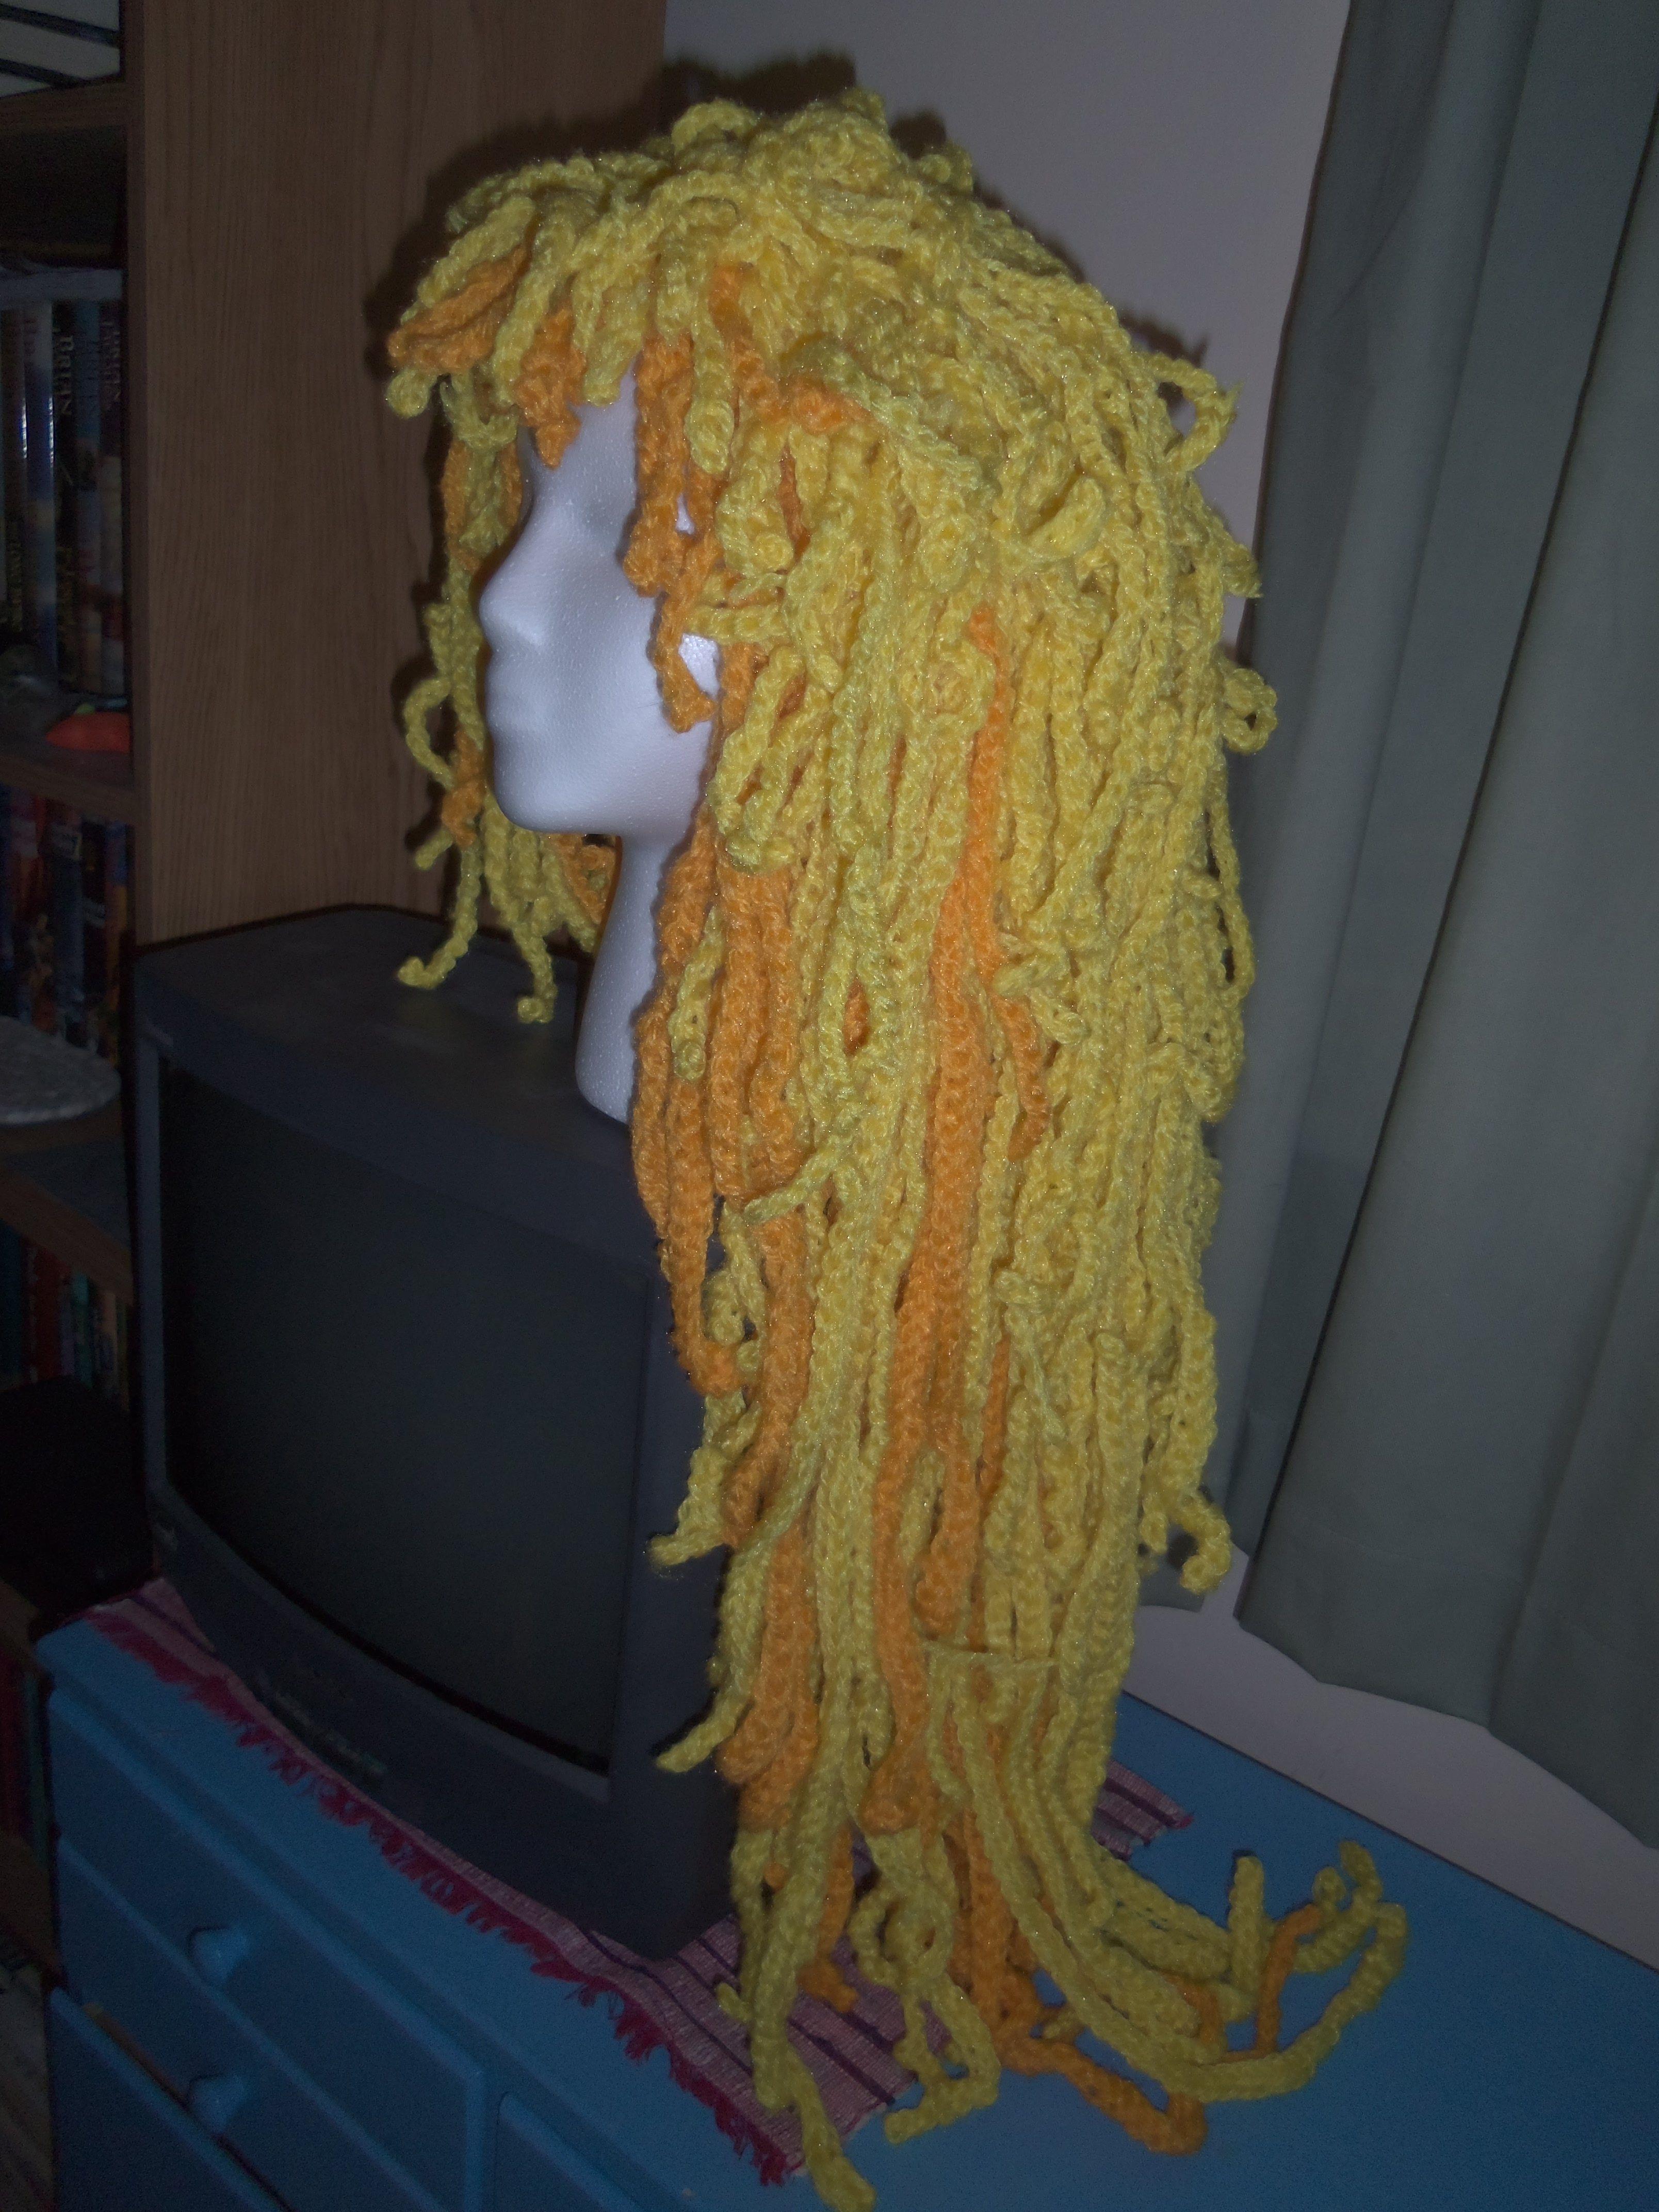 crochet wig crochet passion Pinterest